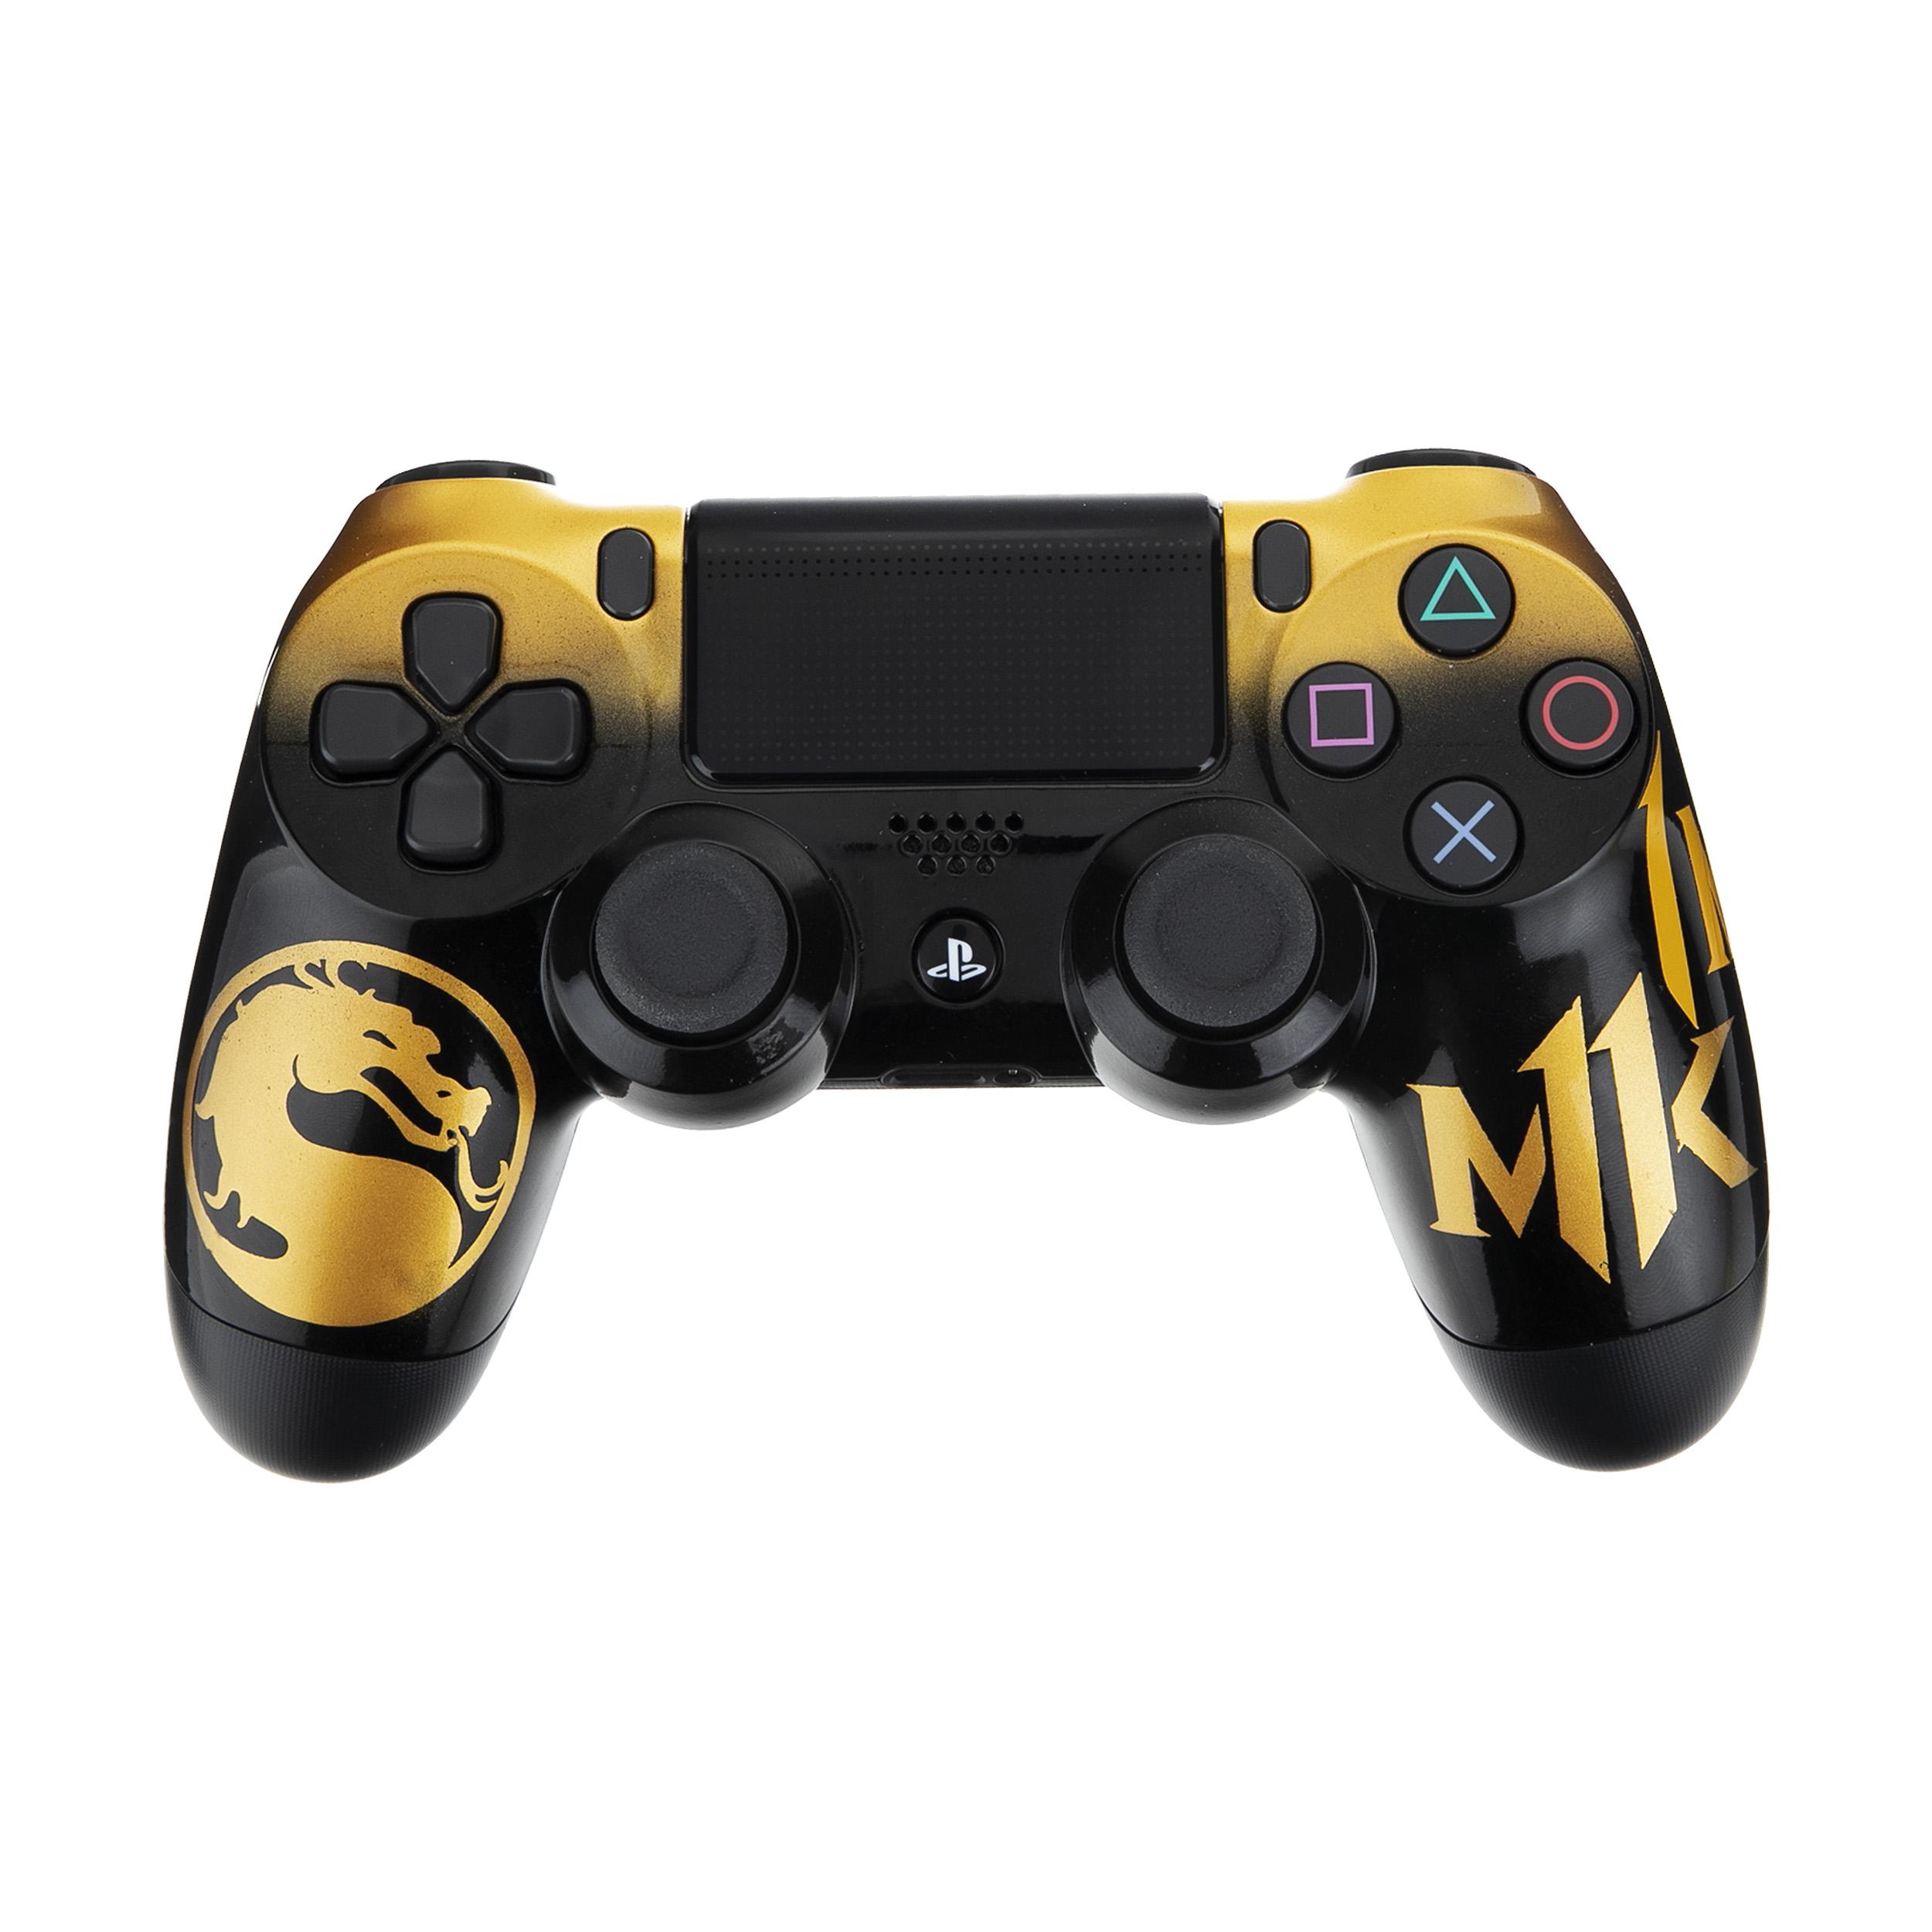 دسته بازی سونی پلی استیشن ۴ مدل CUH-ZCT2E DualShock4 طرح Mortal Kombat